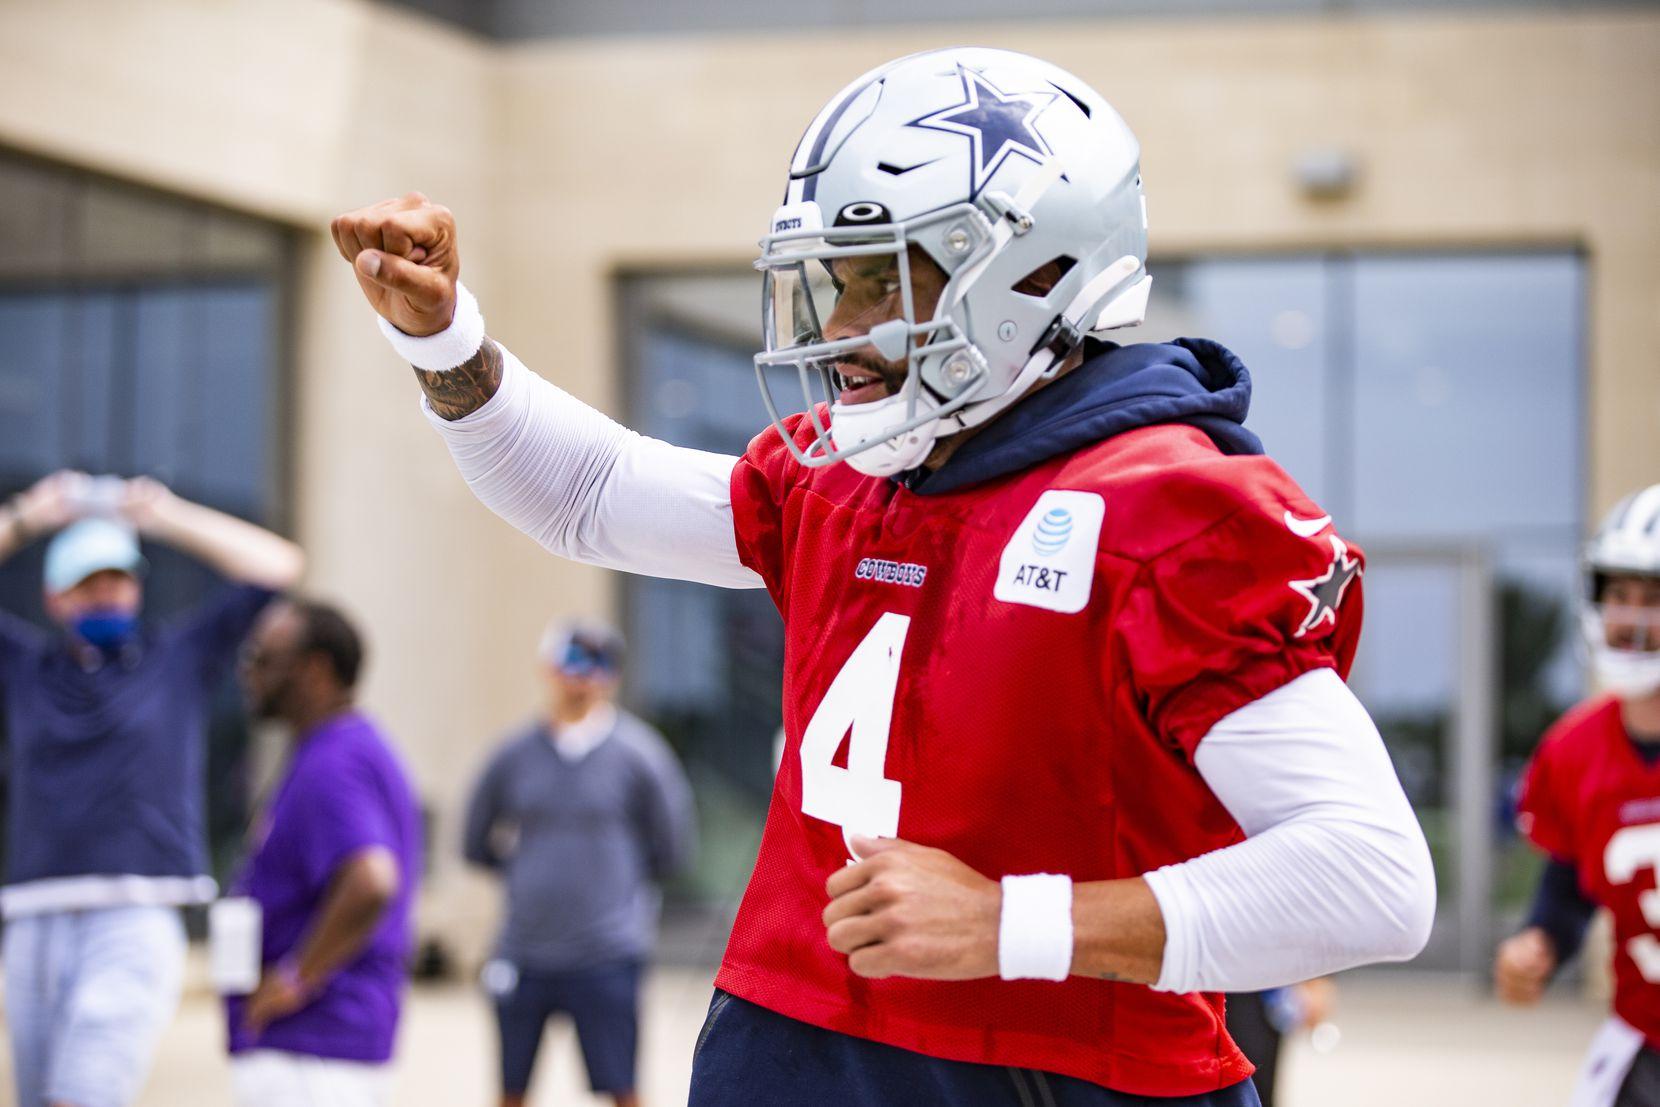 Dallas Cowboys quarterback Dak Prescott (4) runs onto the field during practice at The Star in Frisco, Sunday, September 5, 2021. (Brandon Wade/Special Contributor)